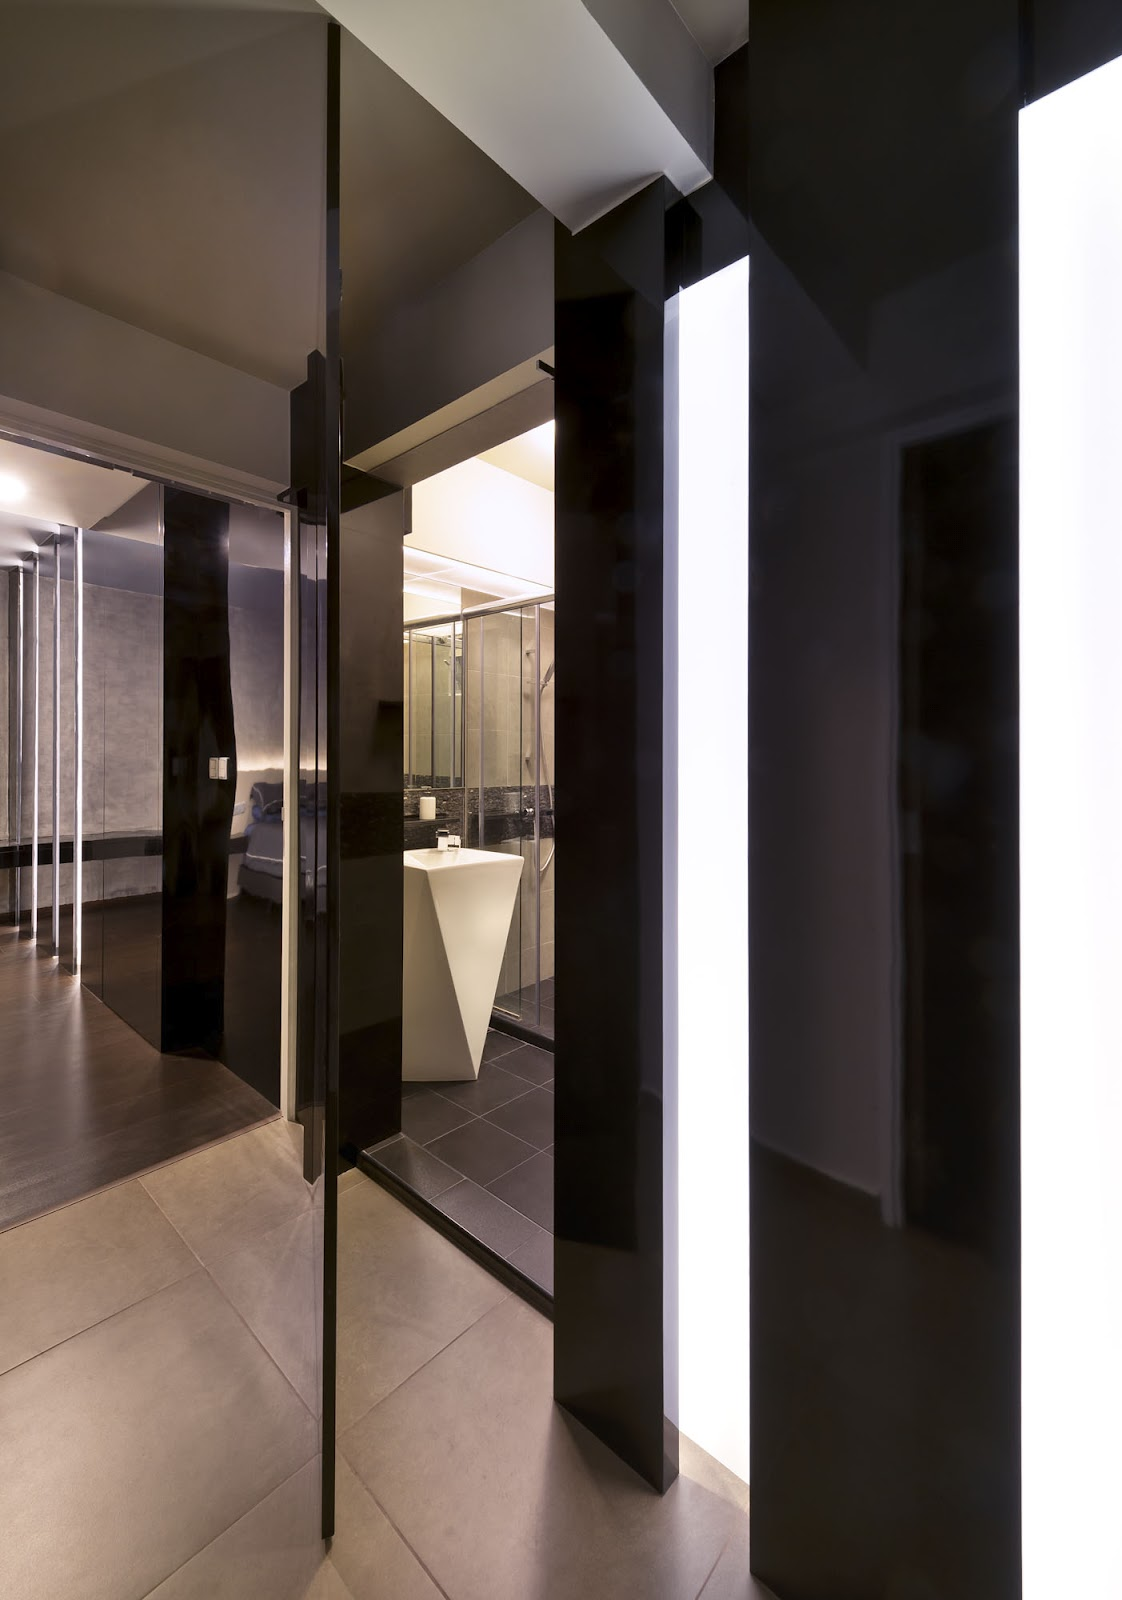 Hdb Toilet Door: Rezt & Relax Interior Design: 4-Room HDB